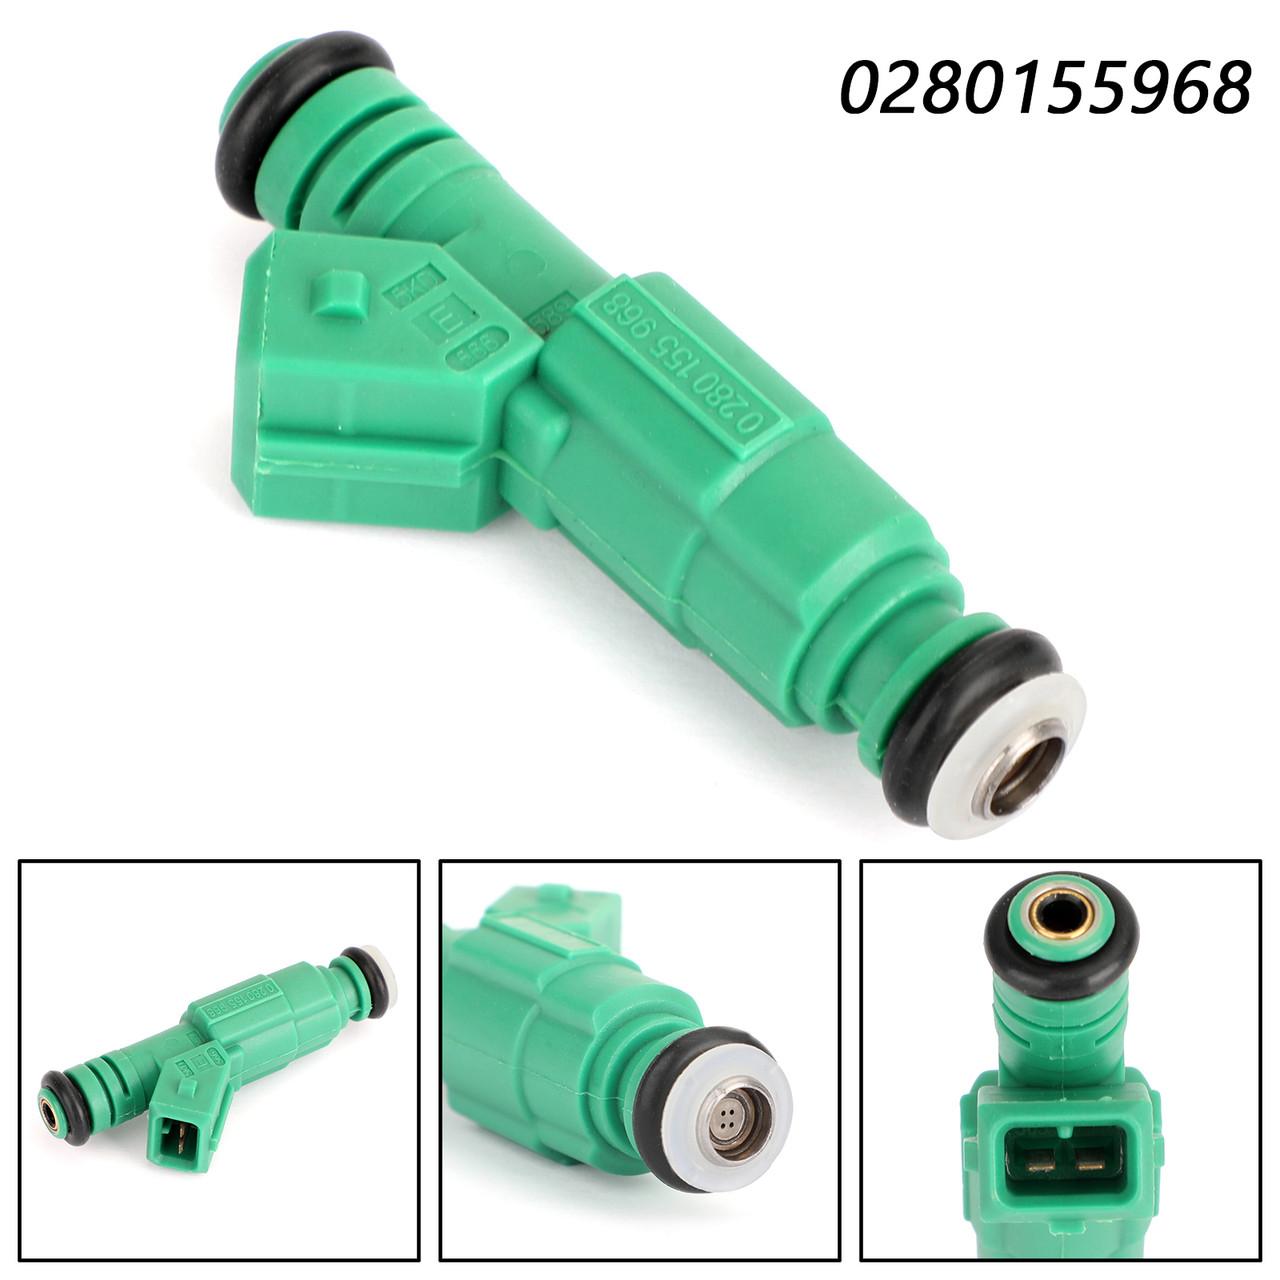 1PCS Fuel Injectors For BMW 318i 92-98 318is 92-96 318ti 95-99 M3 88-91 Z3 96-98 Green